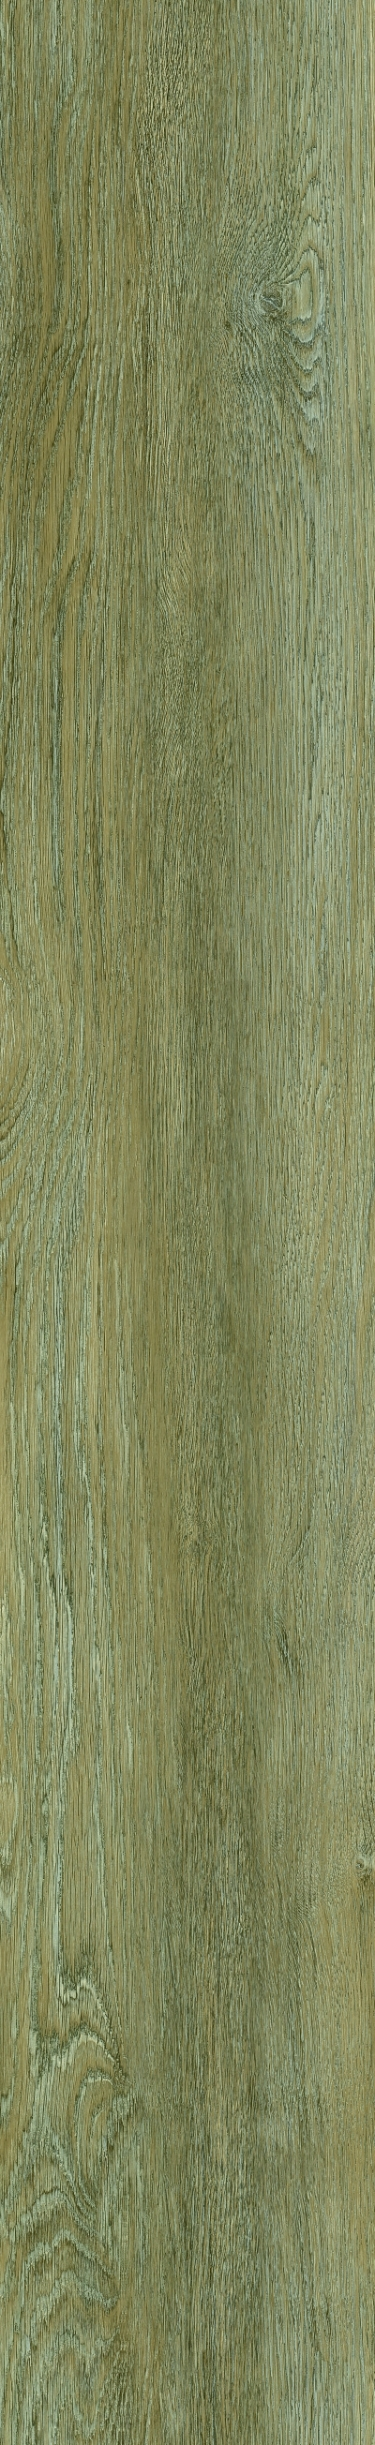 Vinylové podlahy Gerflor DESIGNART Home Rigid Jive Blond